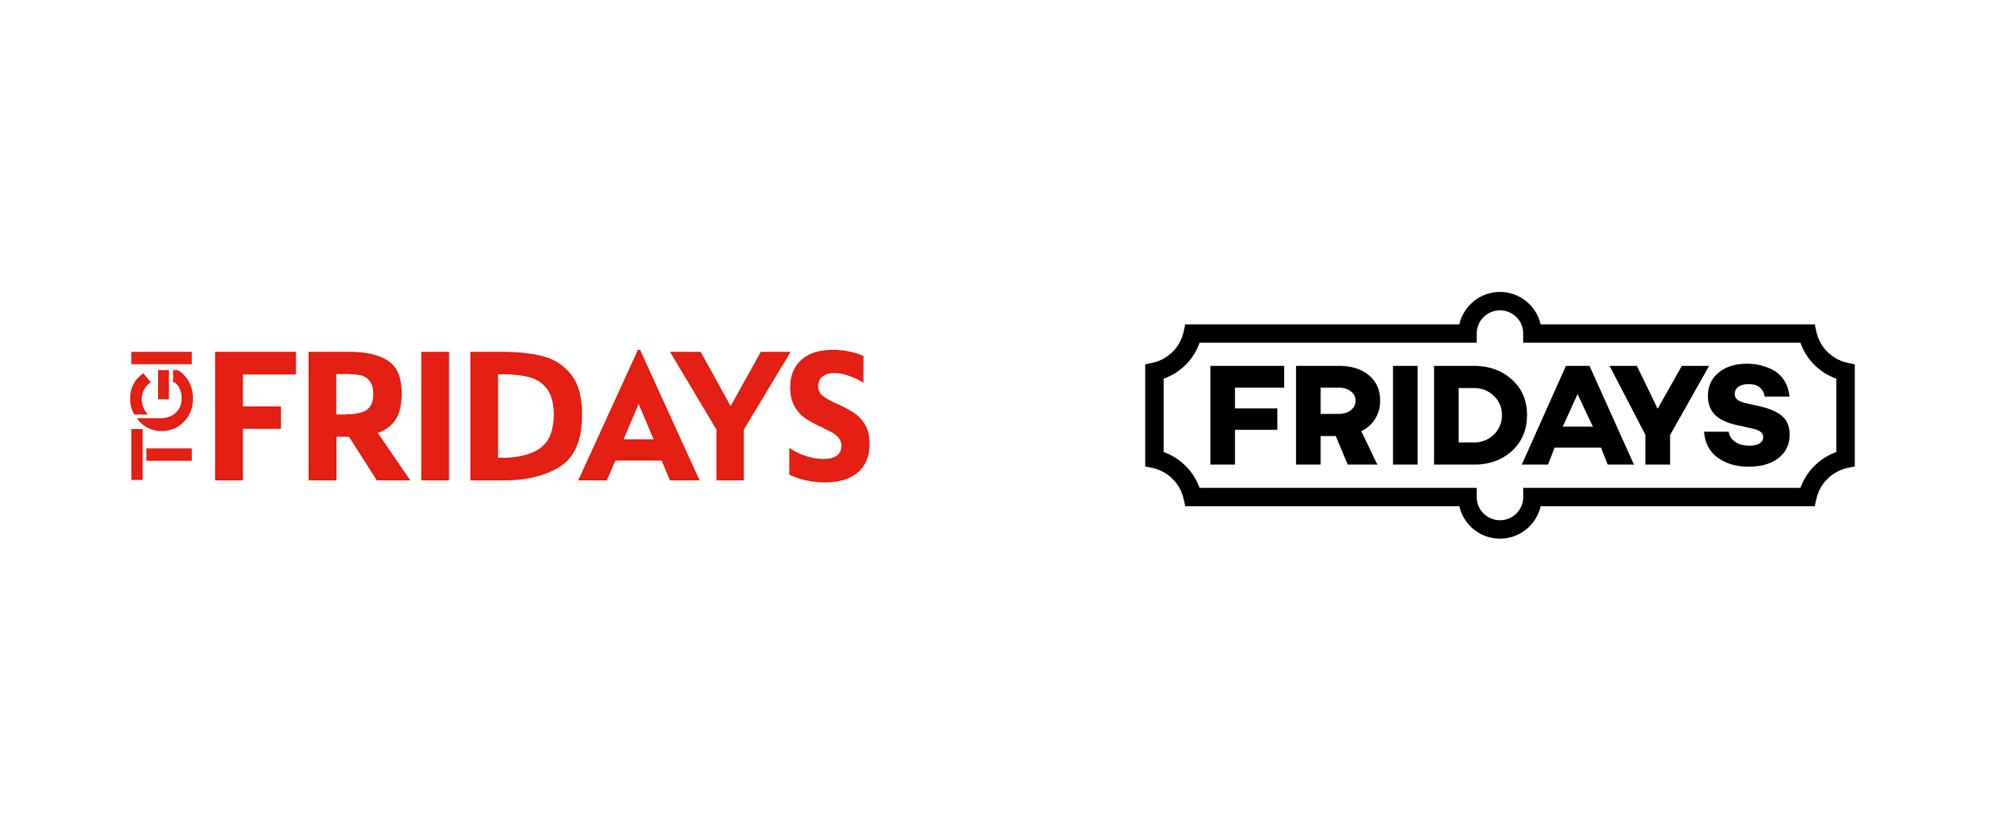 New Logo for TGI Fridays UK